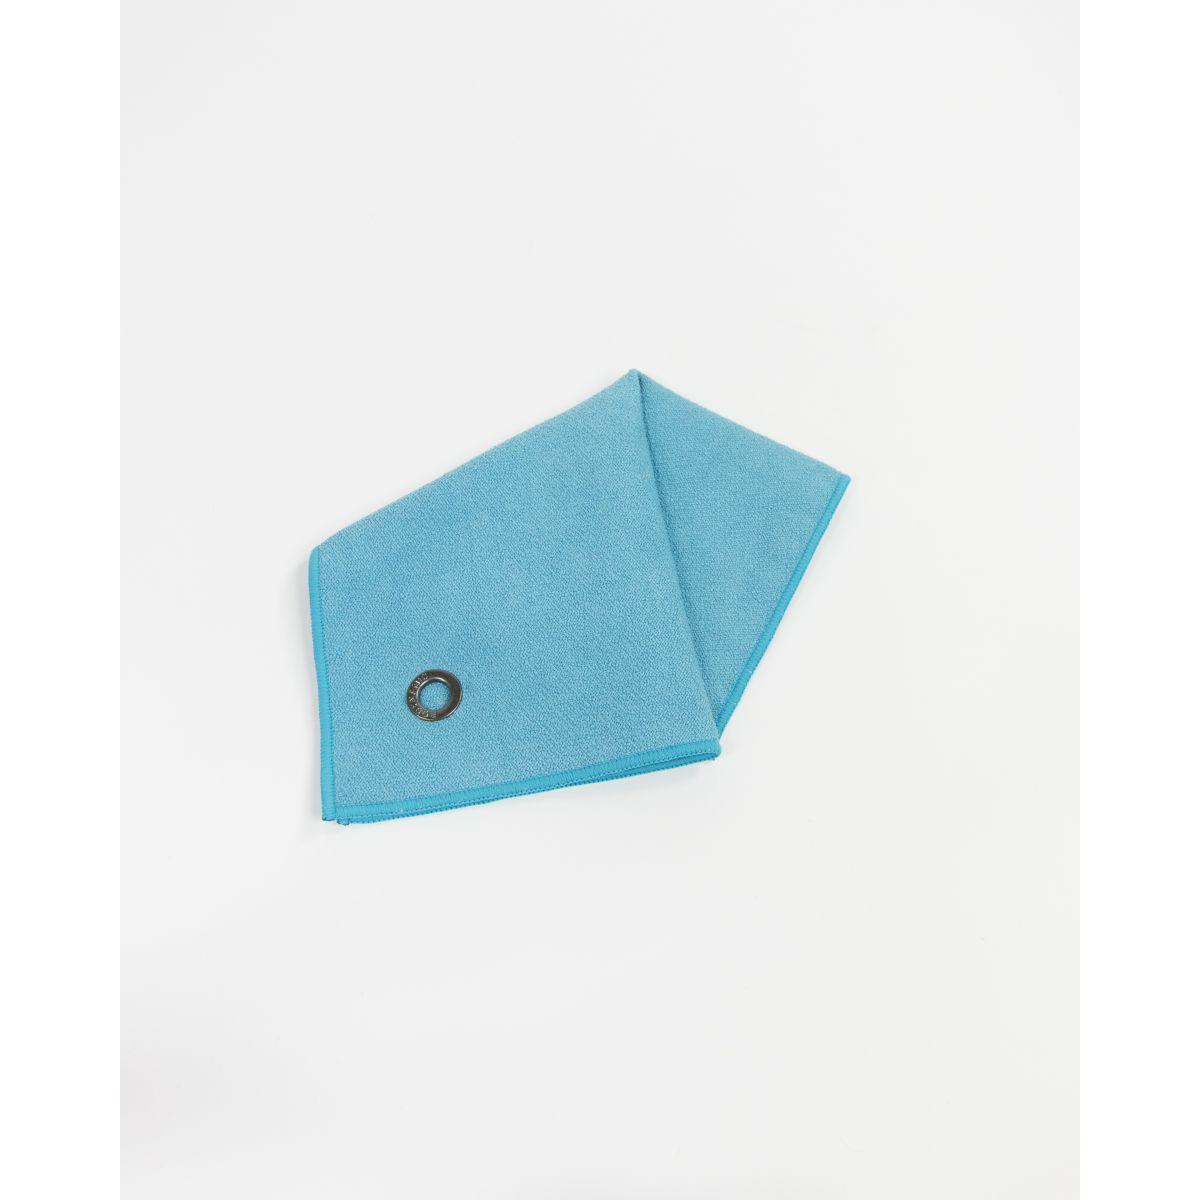 serviette mains visage en microfibre anuanua bleu naiade bodynamic. Black Bedroom Furniture Sets. Home Design Ideas